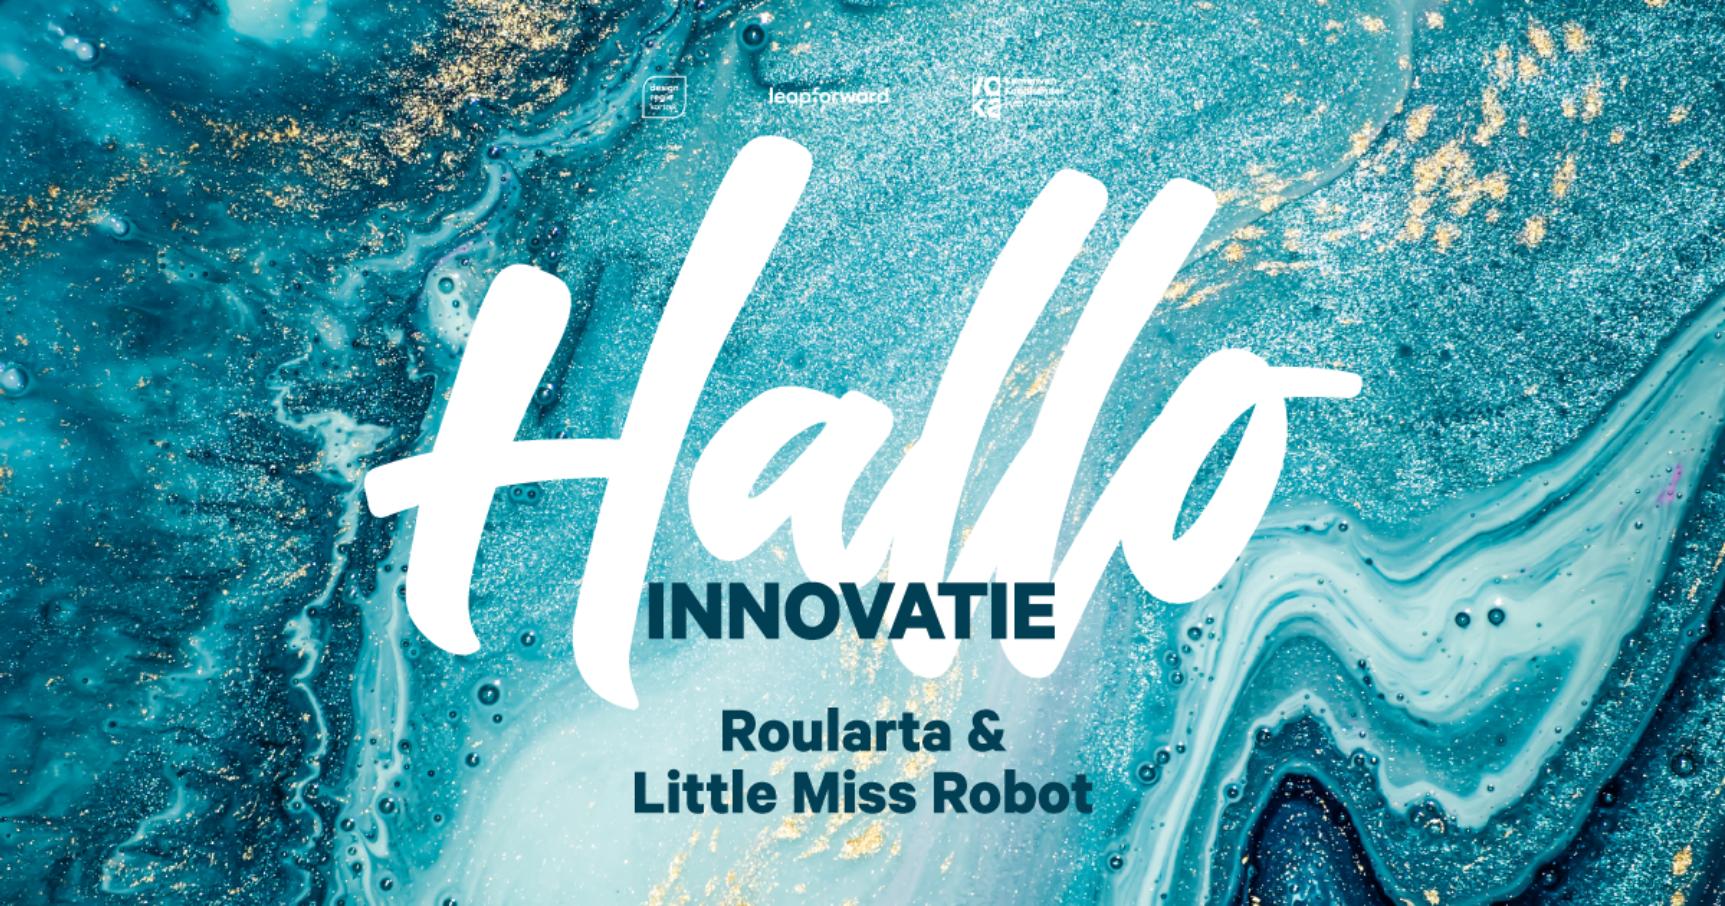 Hallo Innovatie Podcast trailer visual rectangle01